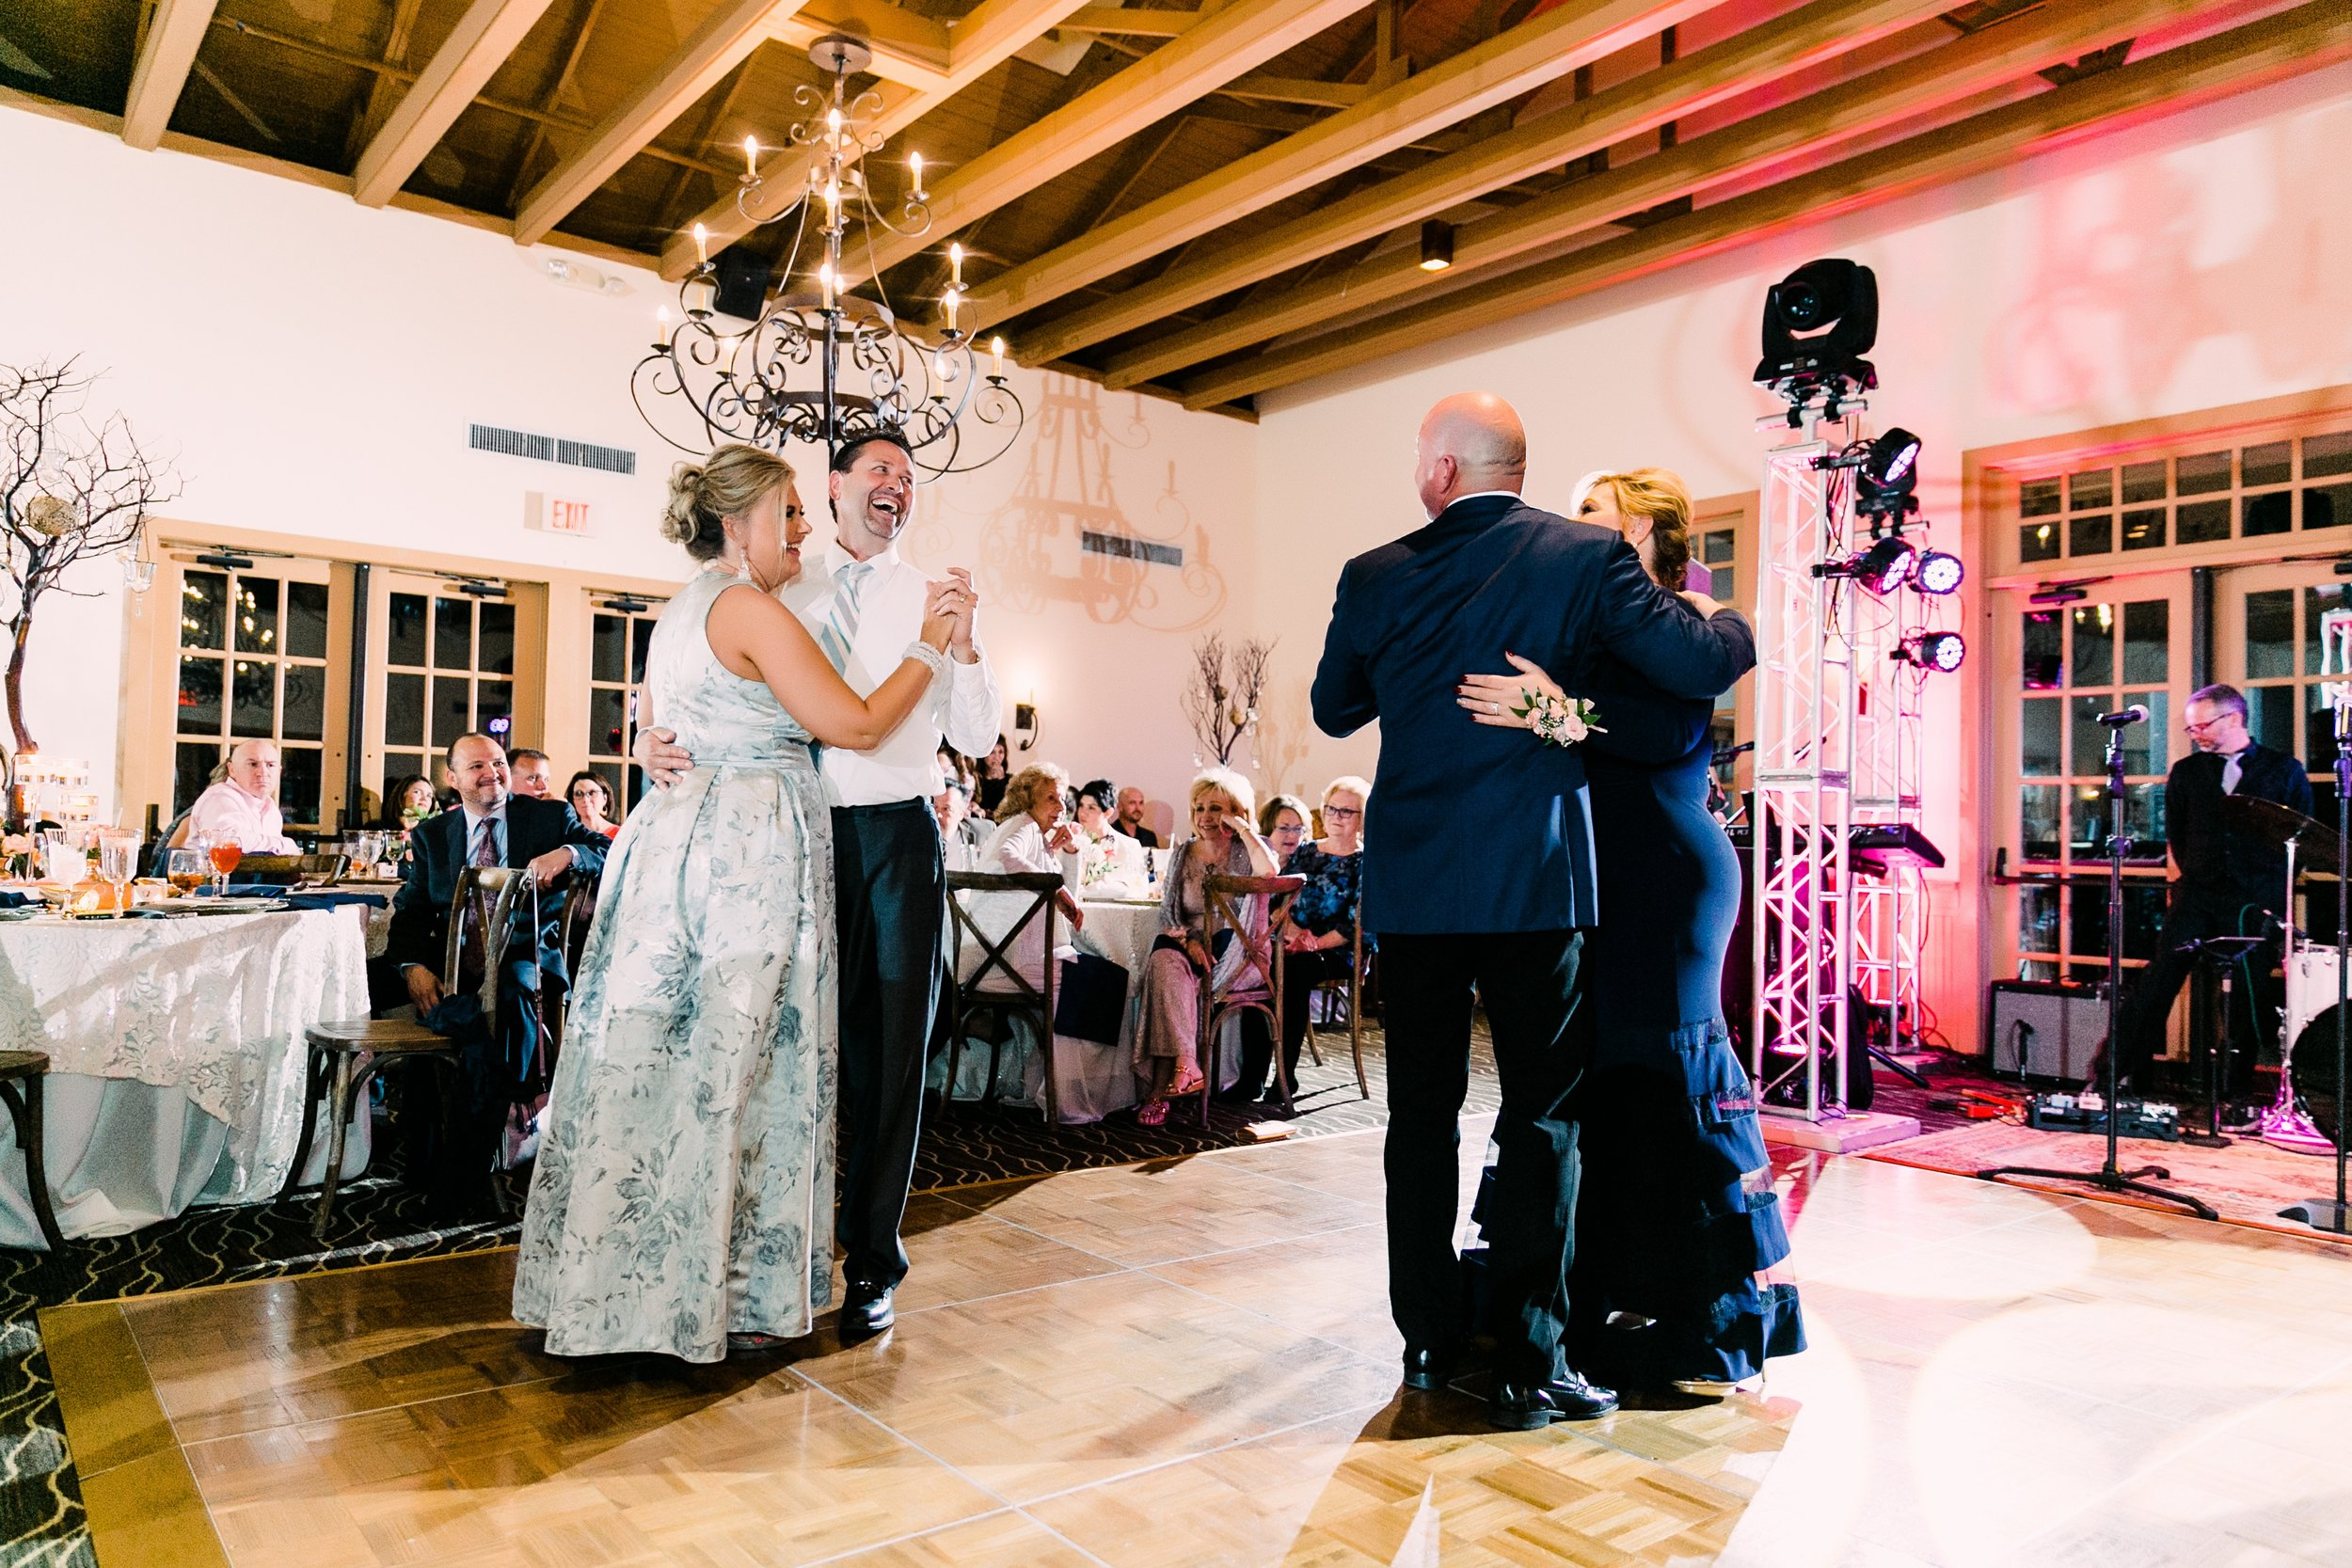 haehn-wedding-little-chapel-in-the-woods-denton-tx-lantana-golf-club-wedding-058.jpg